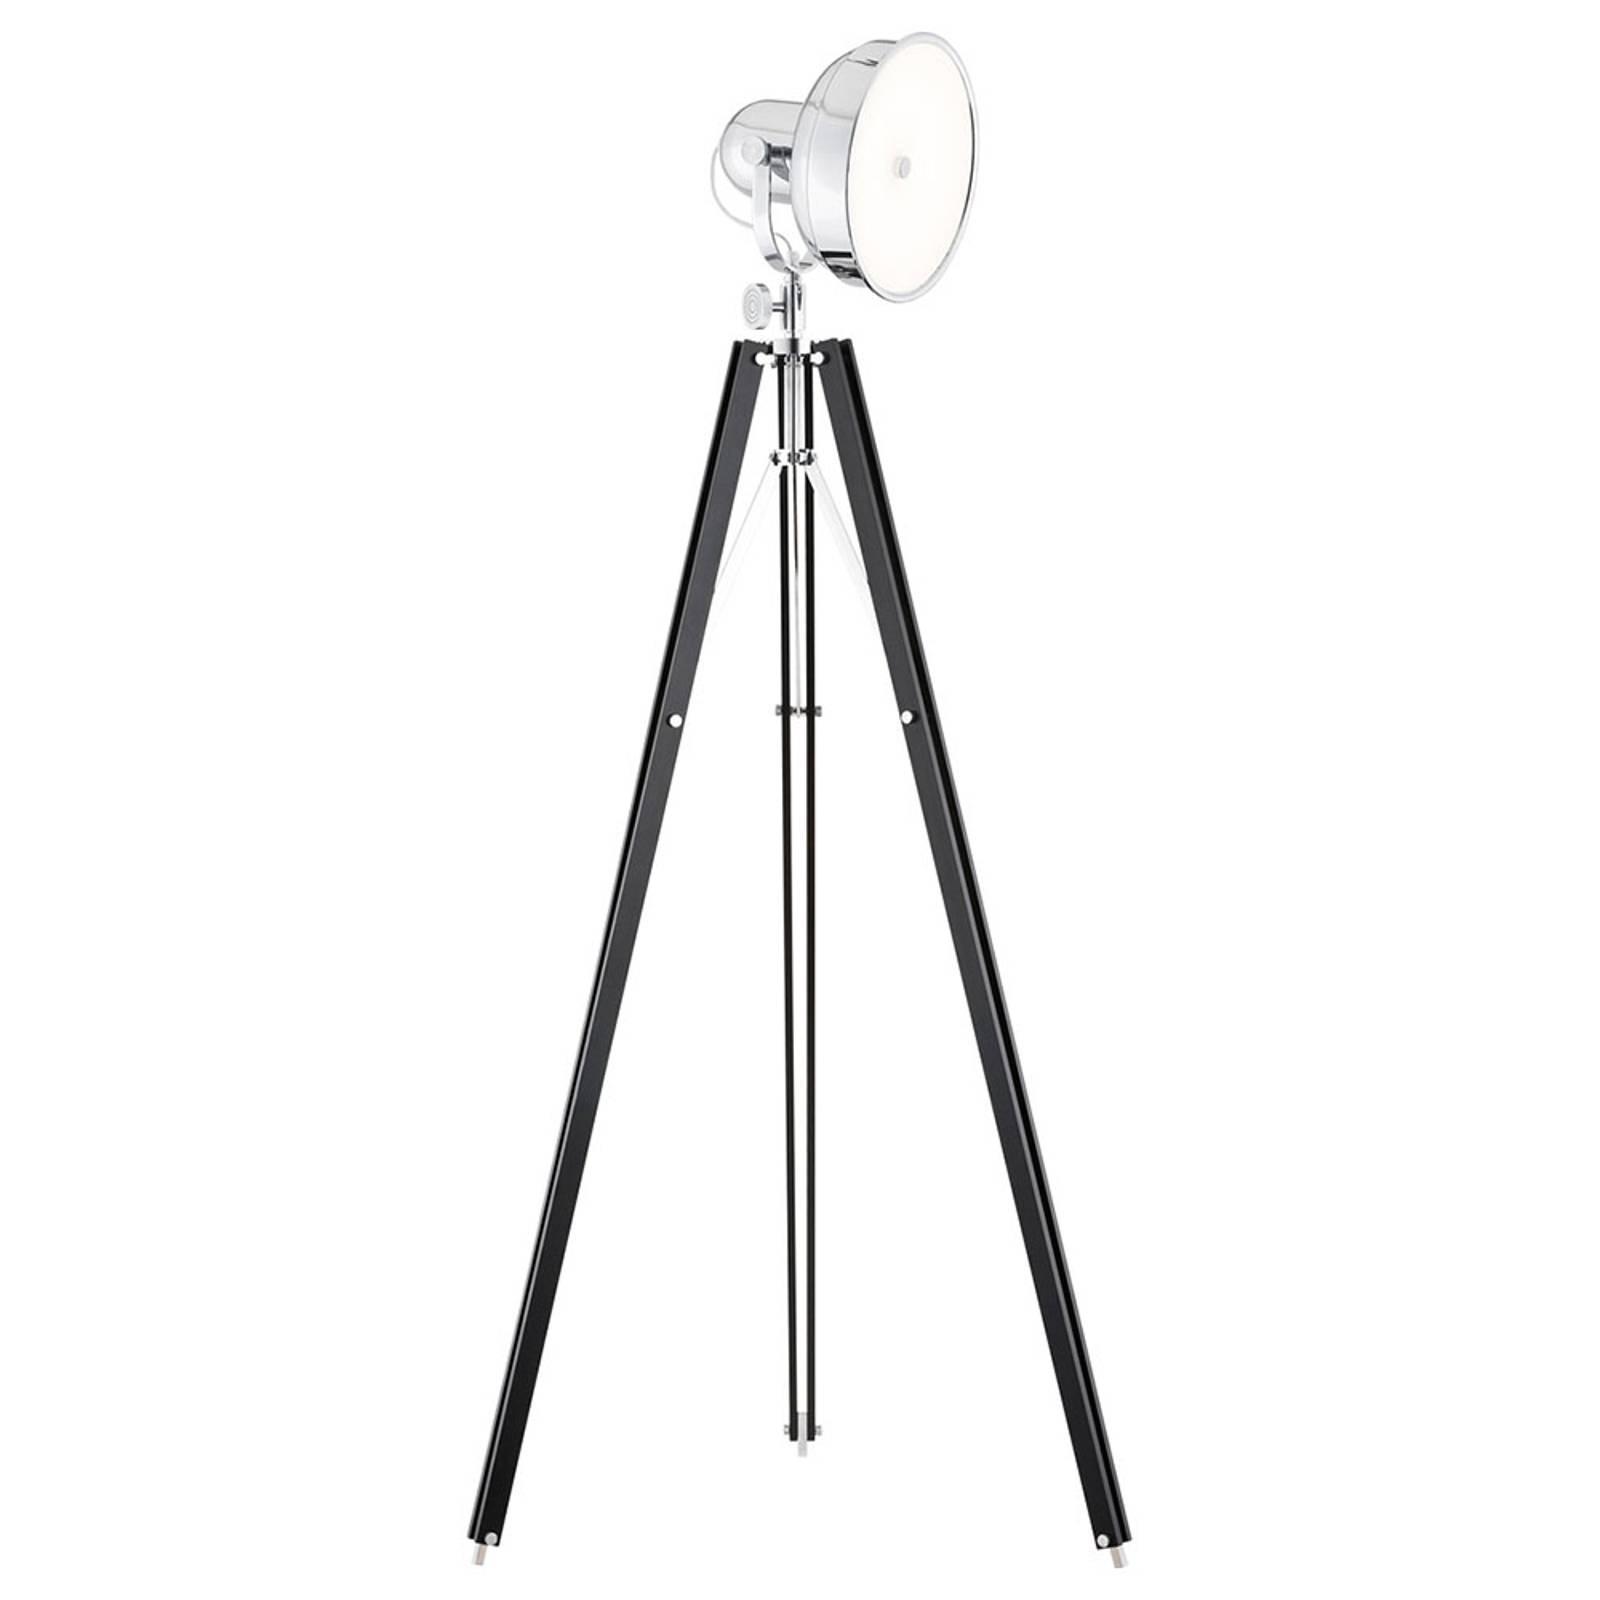 Lampadaire LED Forada trépied bois noir/chrome